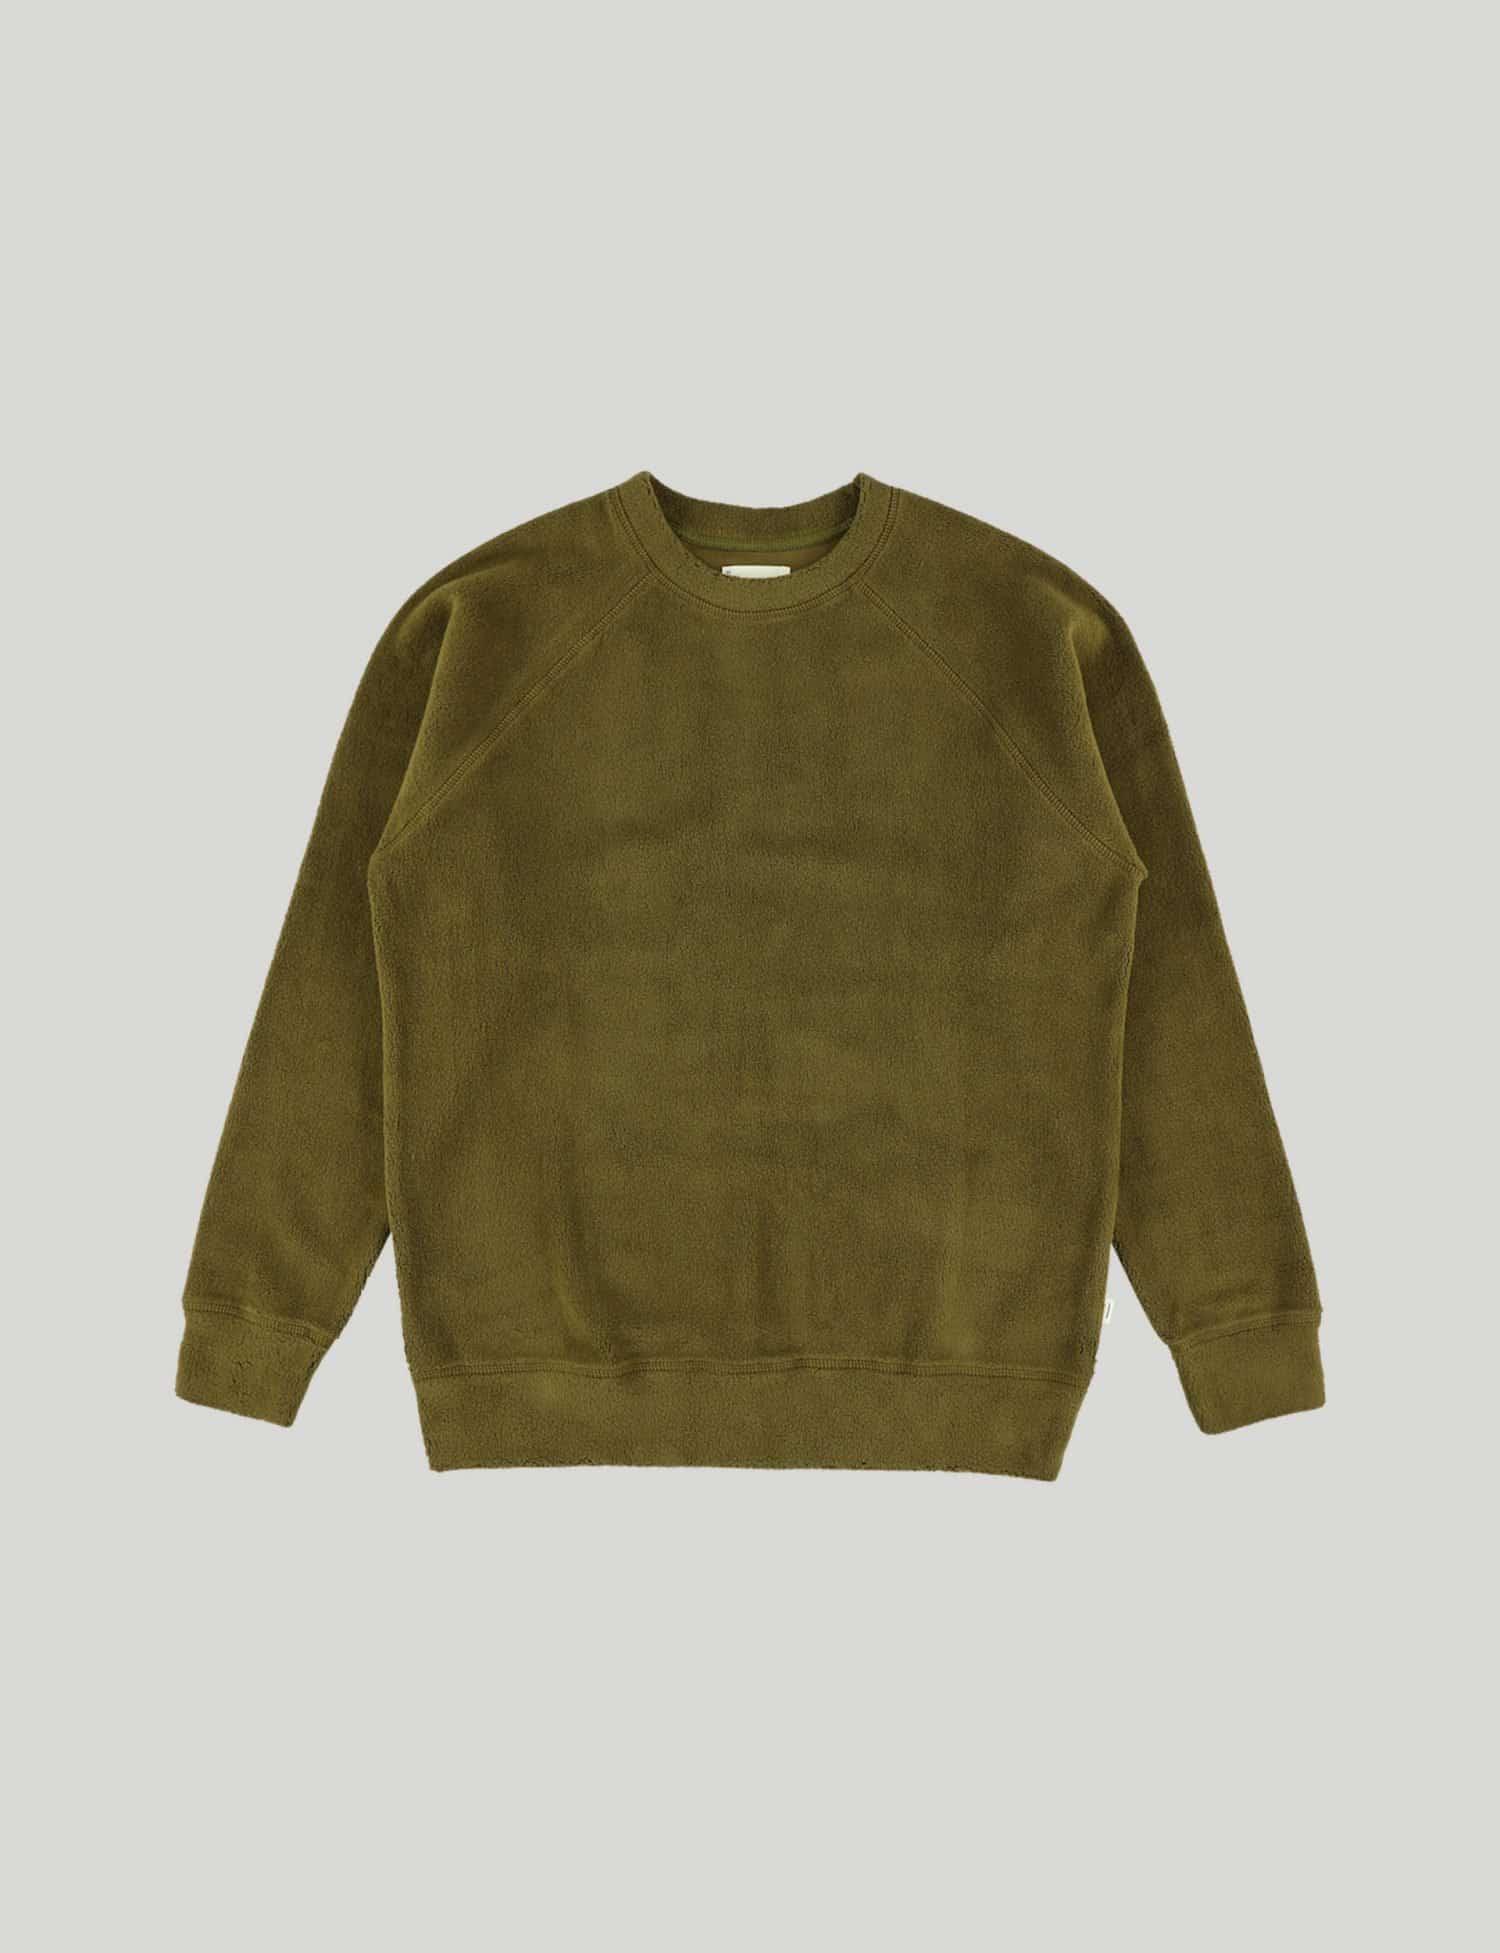 Castart - Matsutake Sweater - Khaki